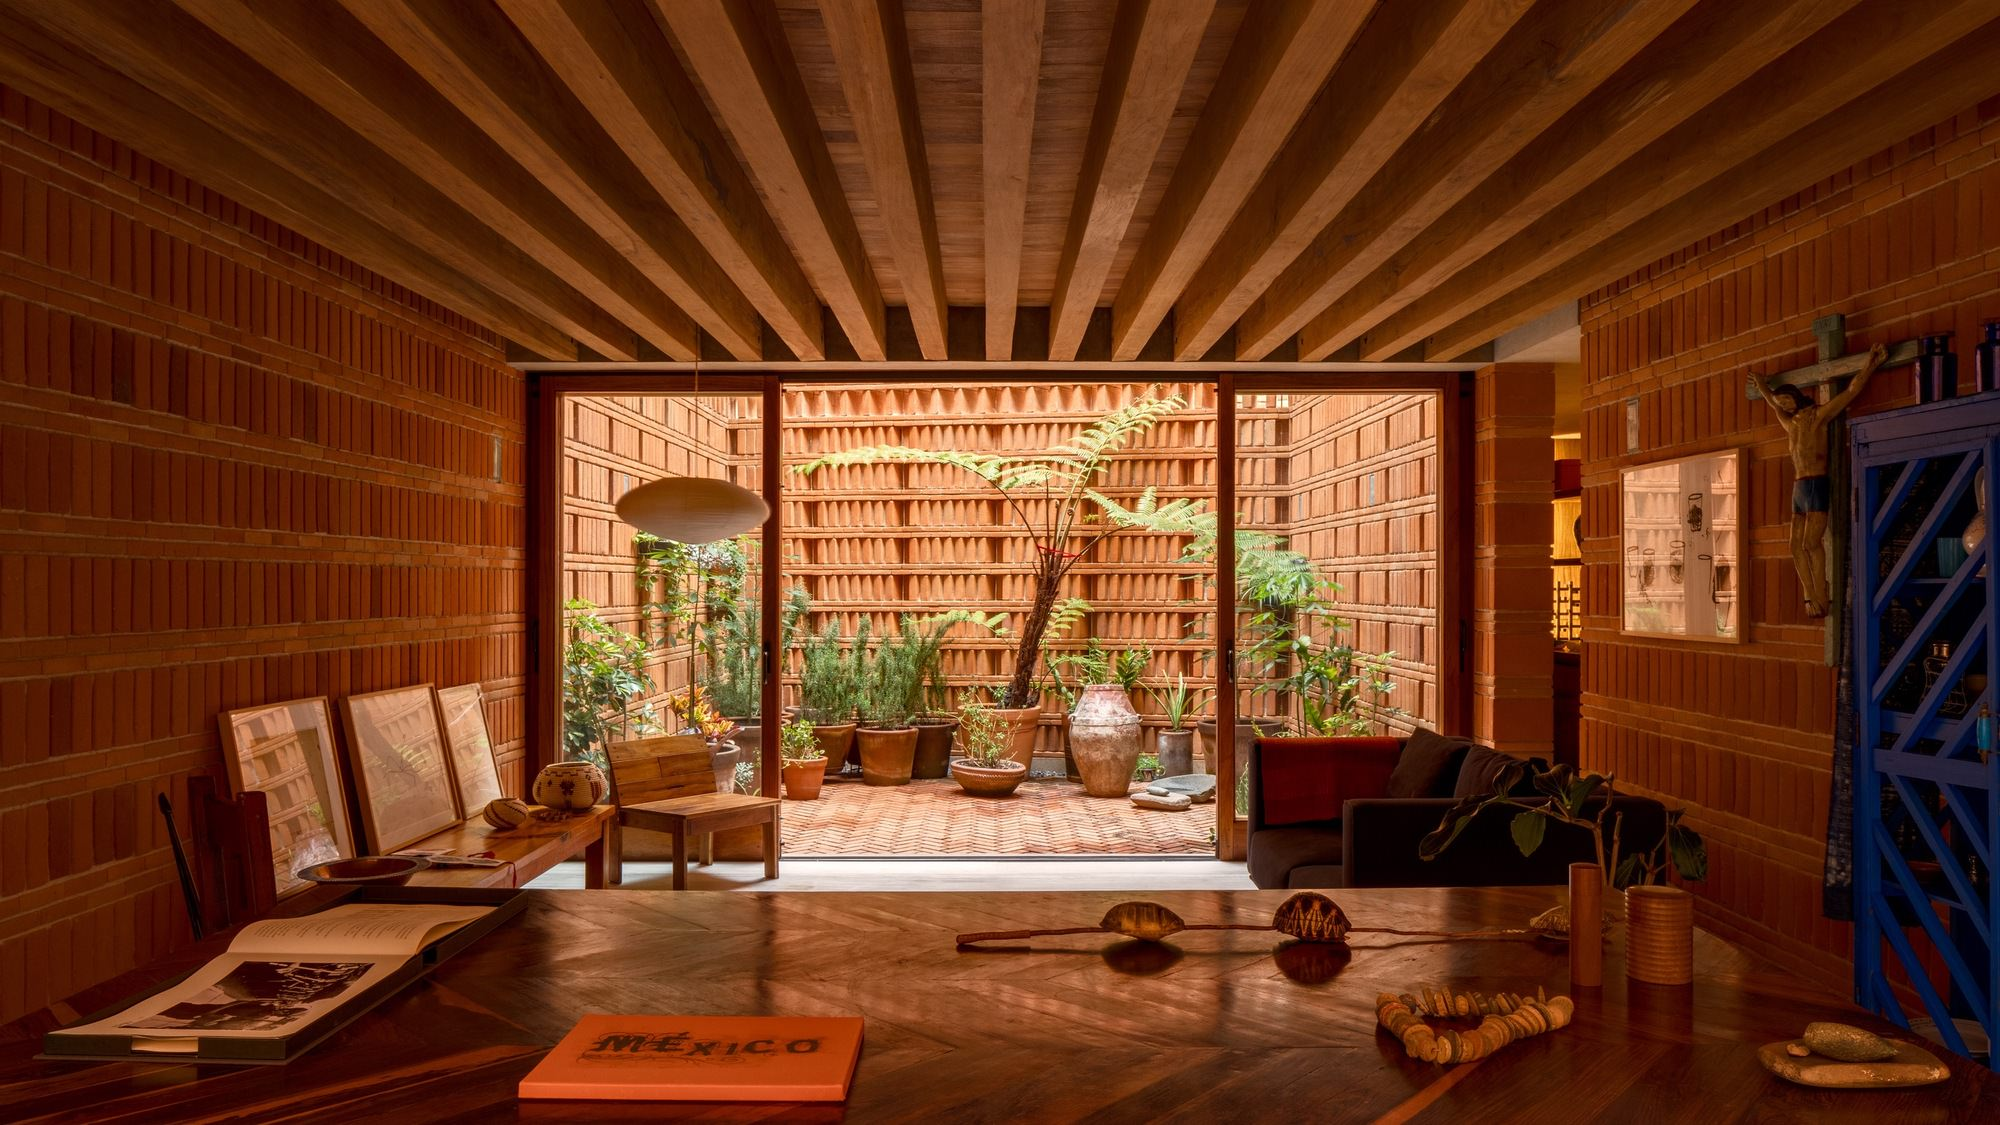 Iturbide Studio Mexico City Brick Architecture Taller Mauricio Rocha Gabriela Carrillo Yellowtrace 19